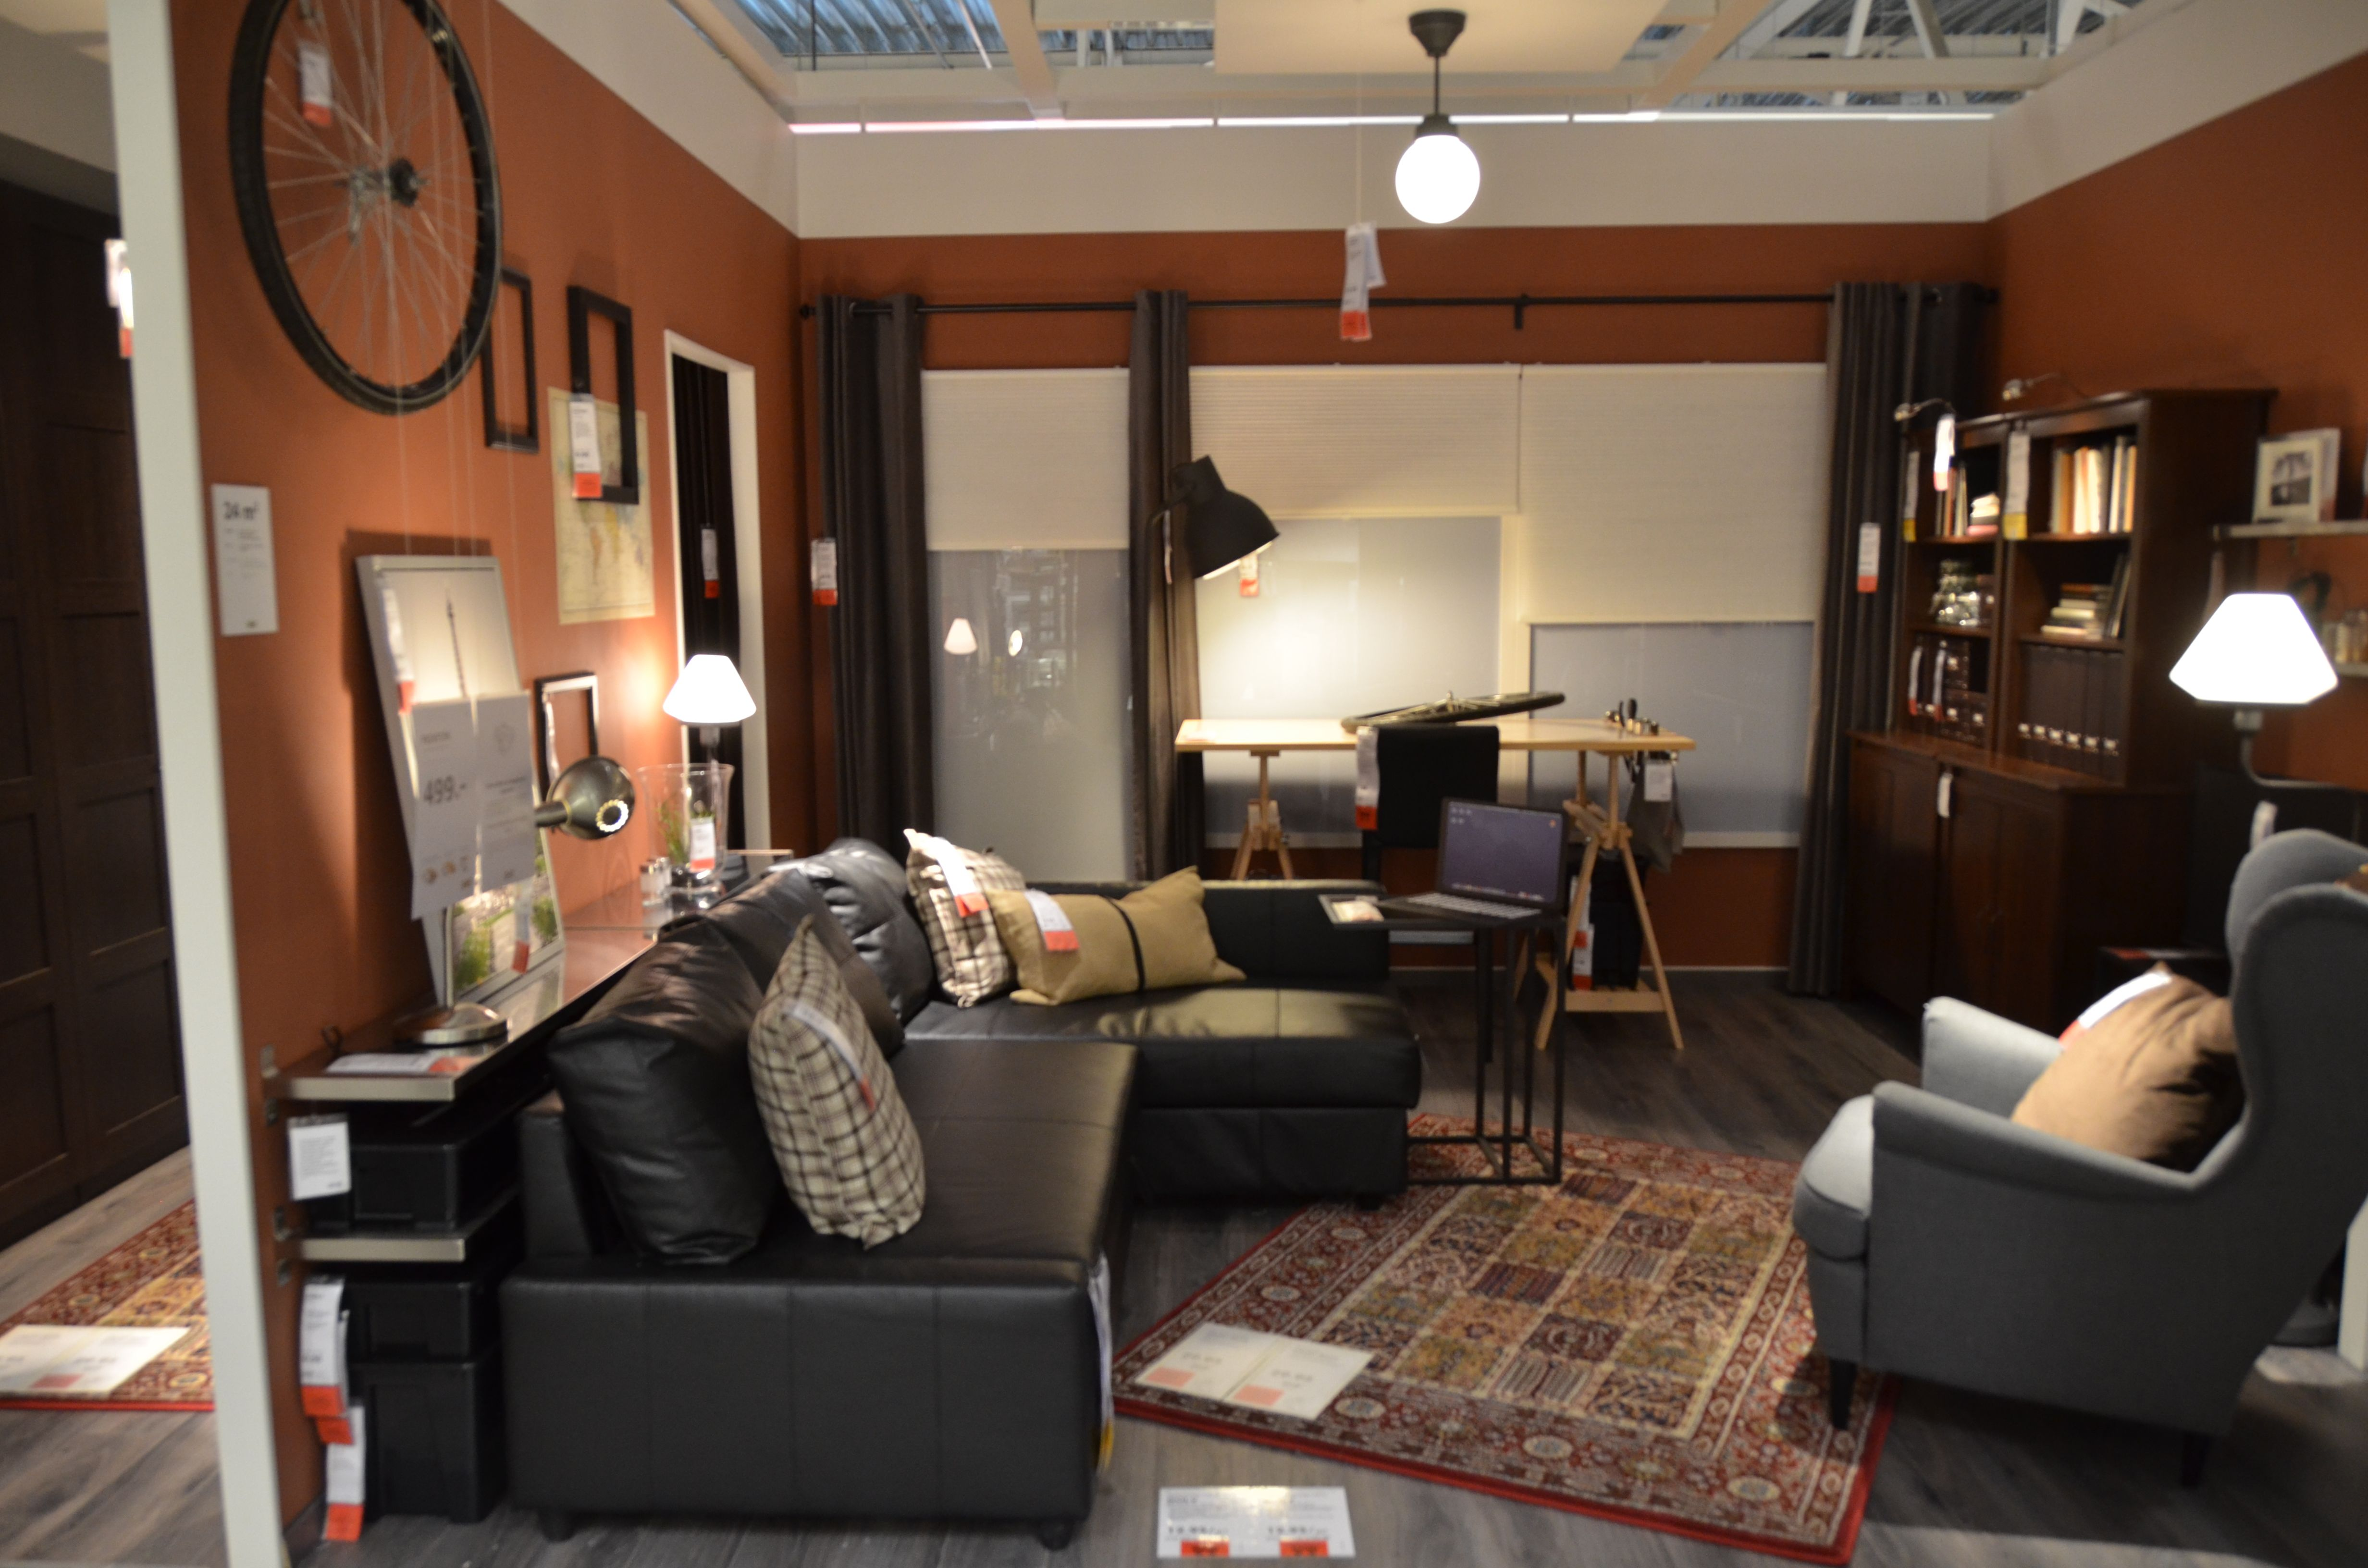 Living Room Corner Chairs: FRIHETEN Corner Sofa Bed Black